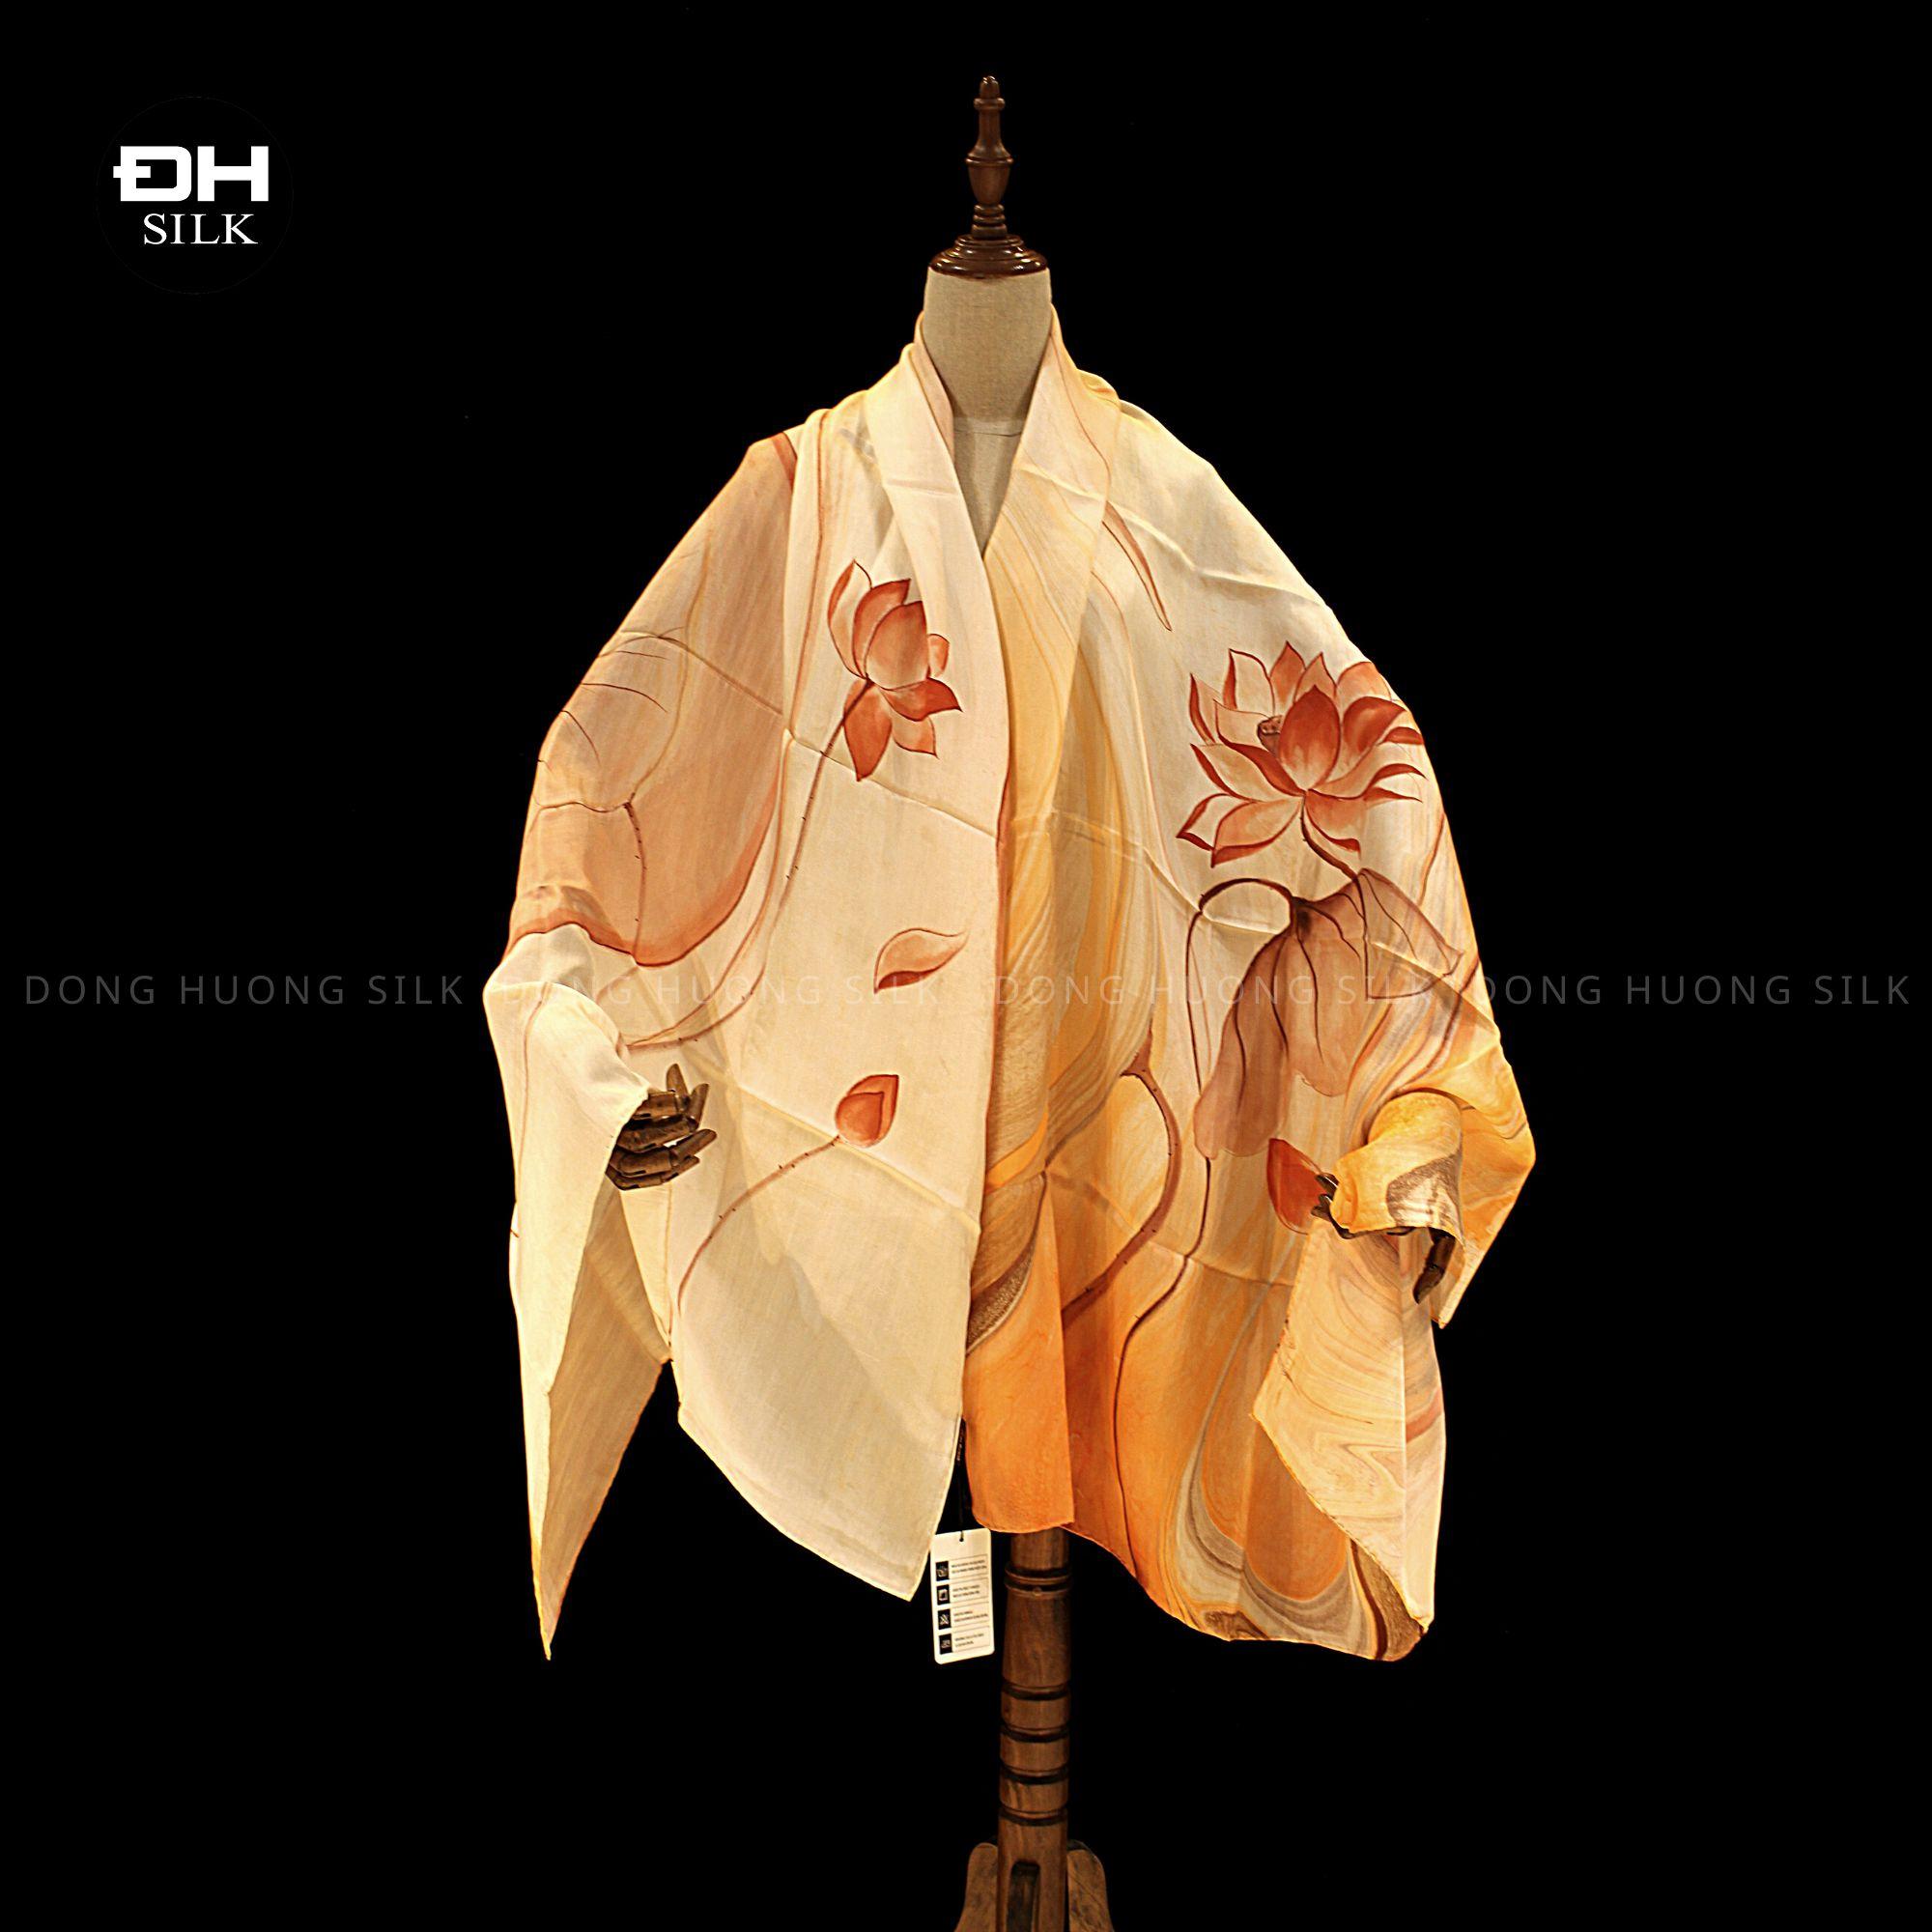 khan-lua-to-tam-ve-tay-thuy-an-nghe-thuat-hoa-sen-vinh-cuu-Dong-Huong-Silk-2